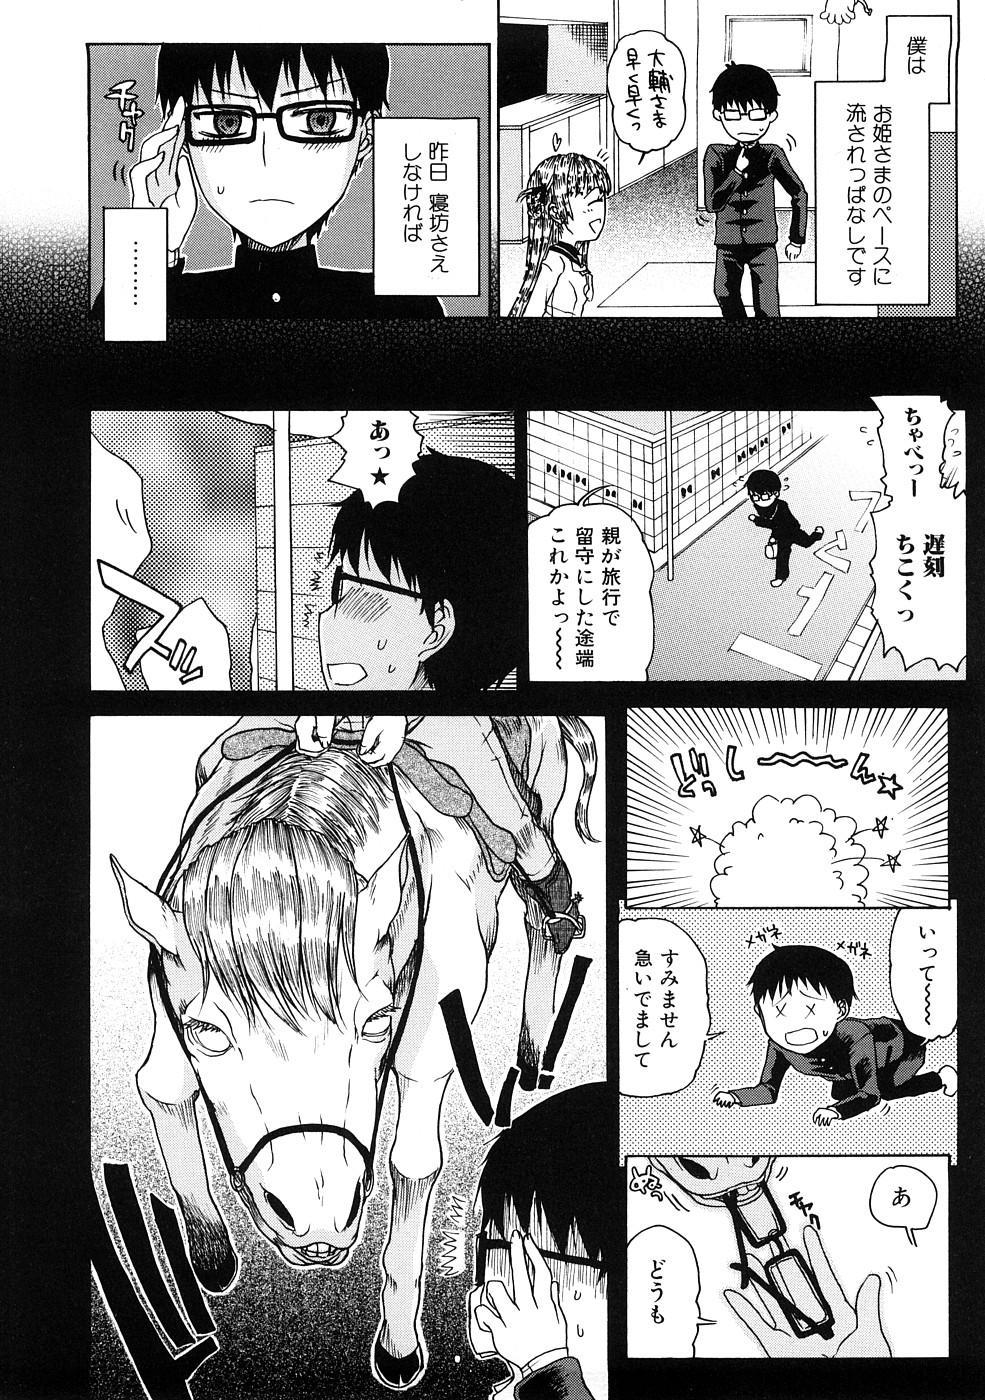 Ecchi de Jibunkatte de Kawaii Ko 7